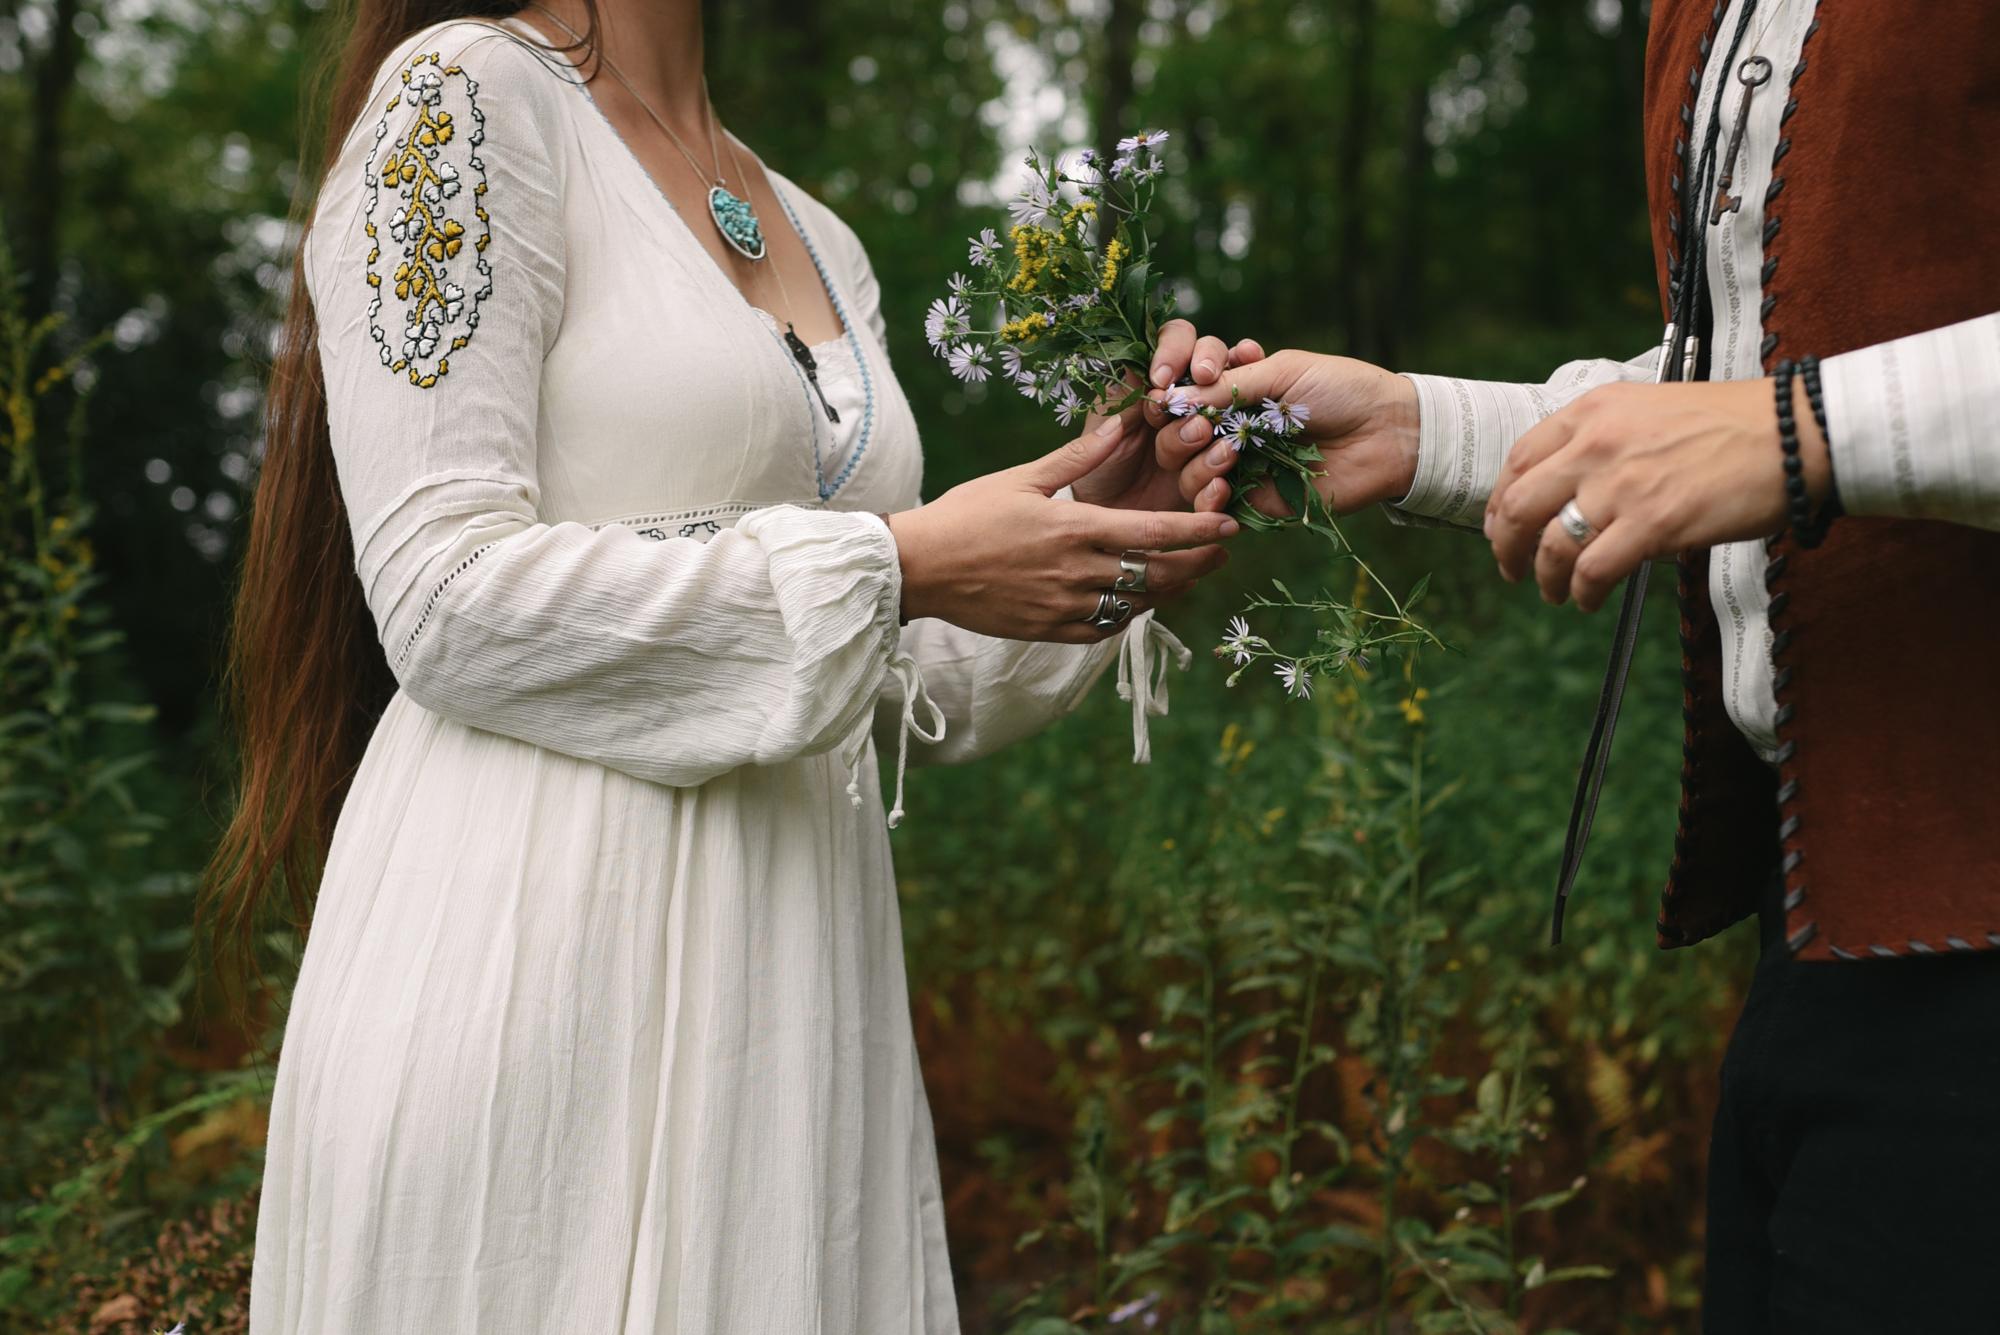 Mountain Wedding, Outdoors, Rustic, West Virginia, Maryland Wedding Photographer, DIY, Casual, sweet photo of groom giving bride wildflowers